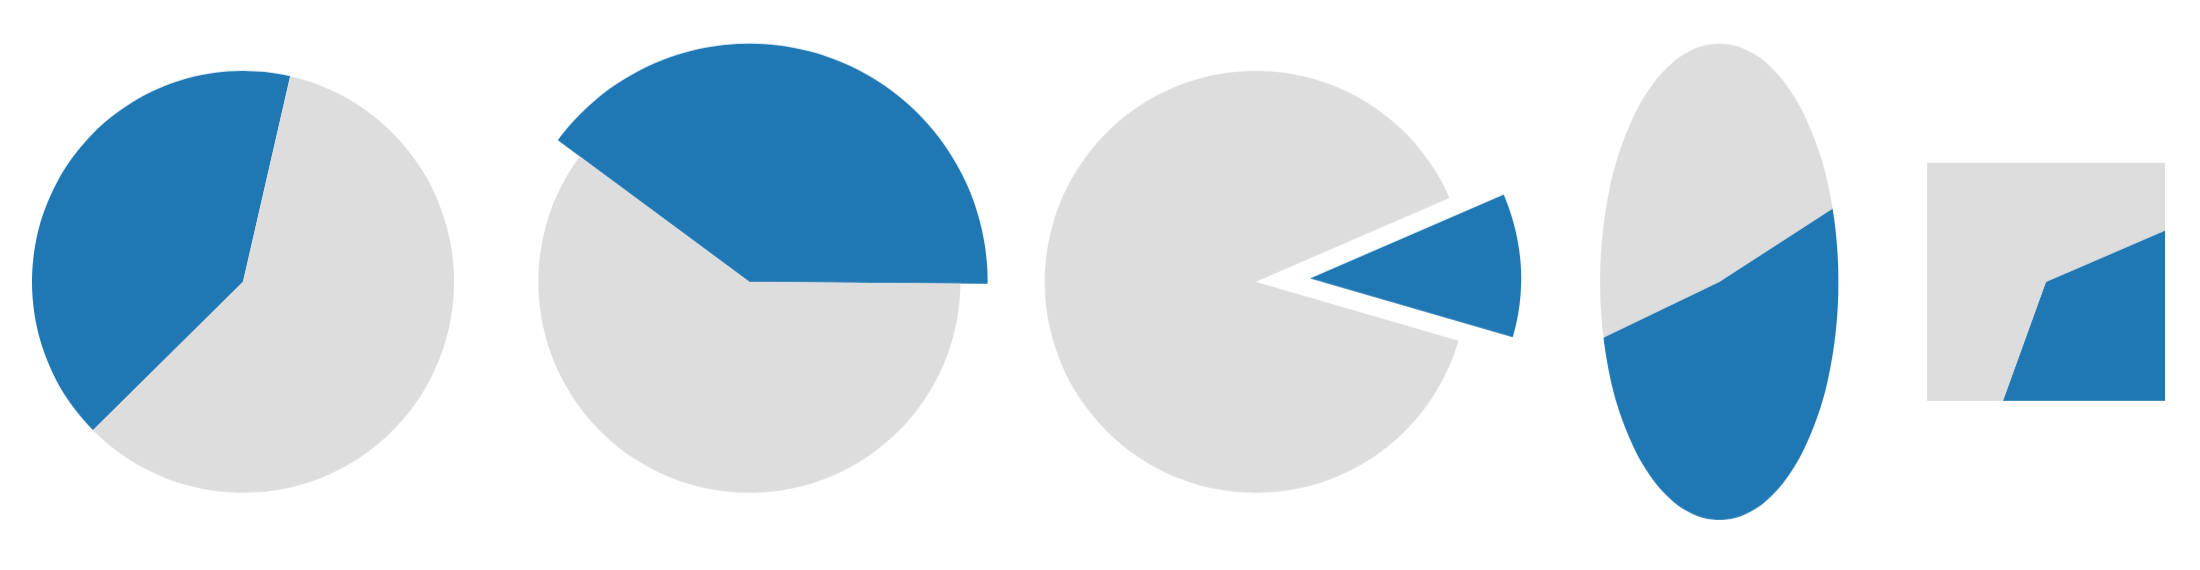 pie-variations